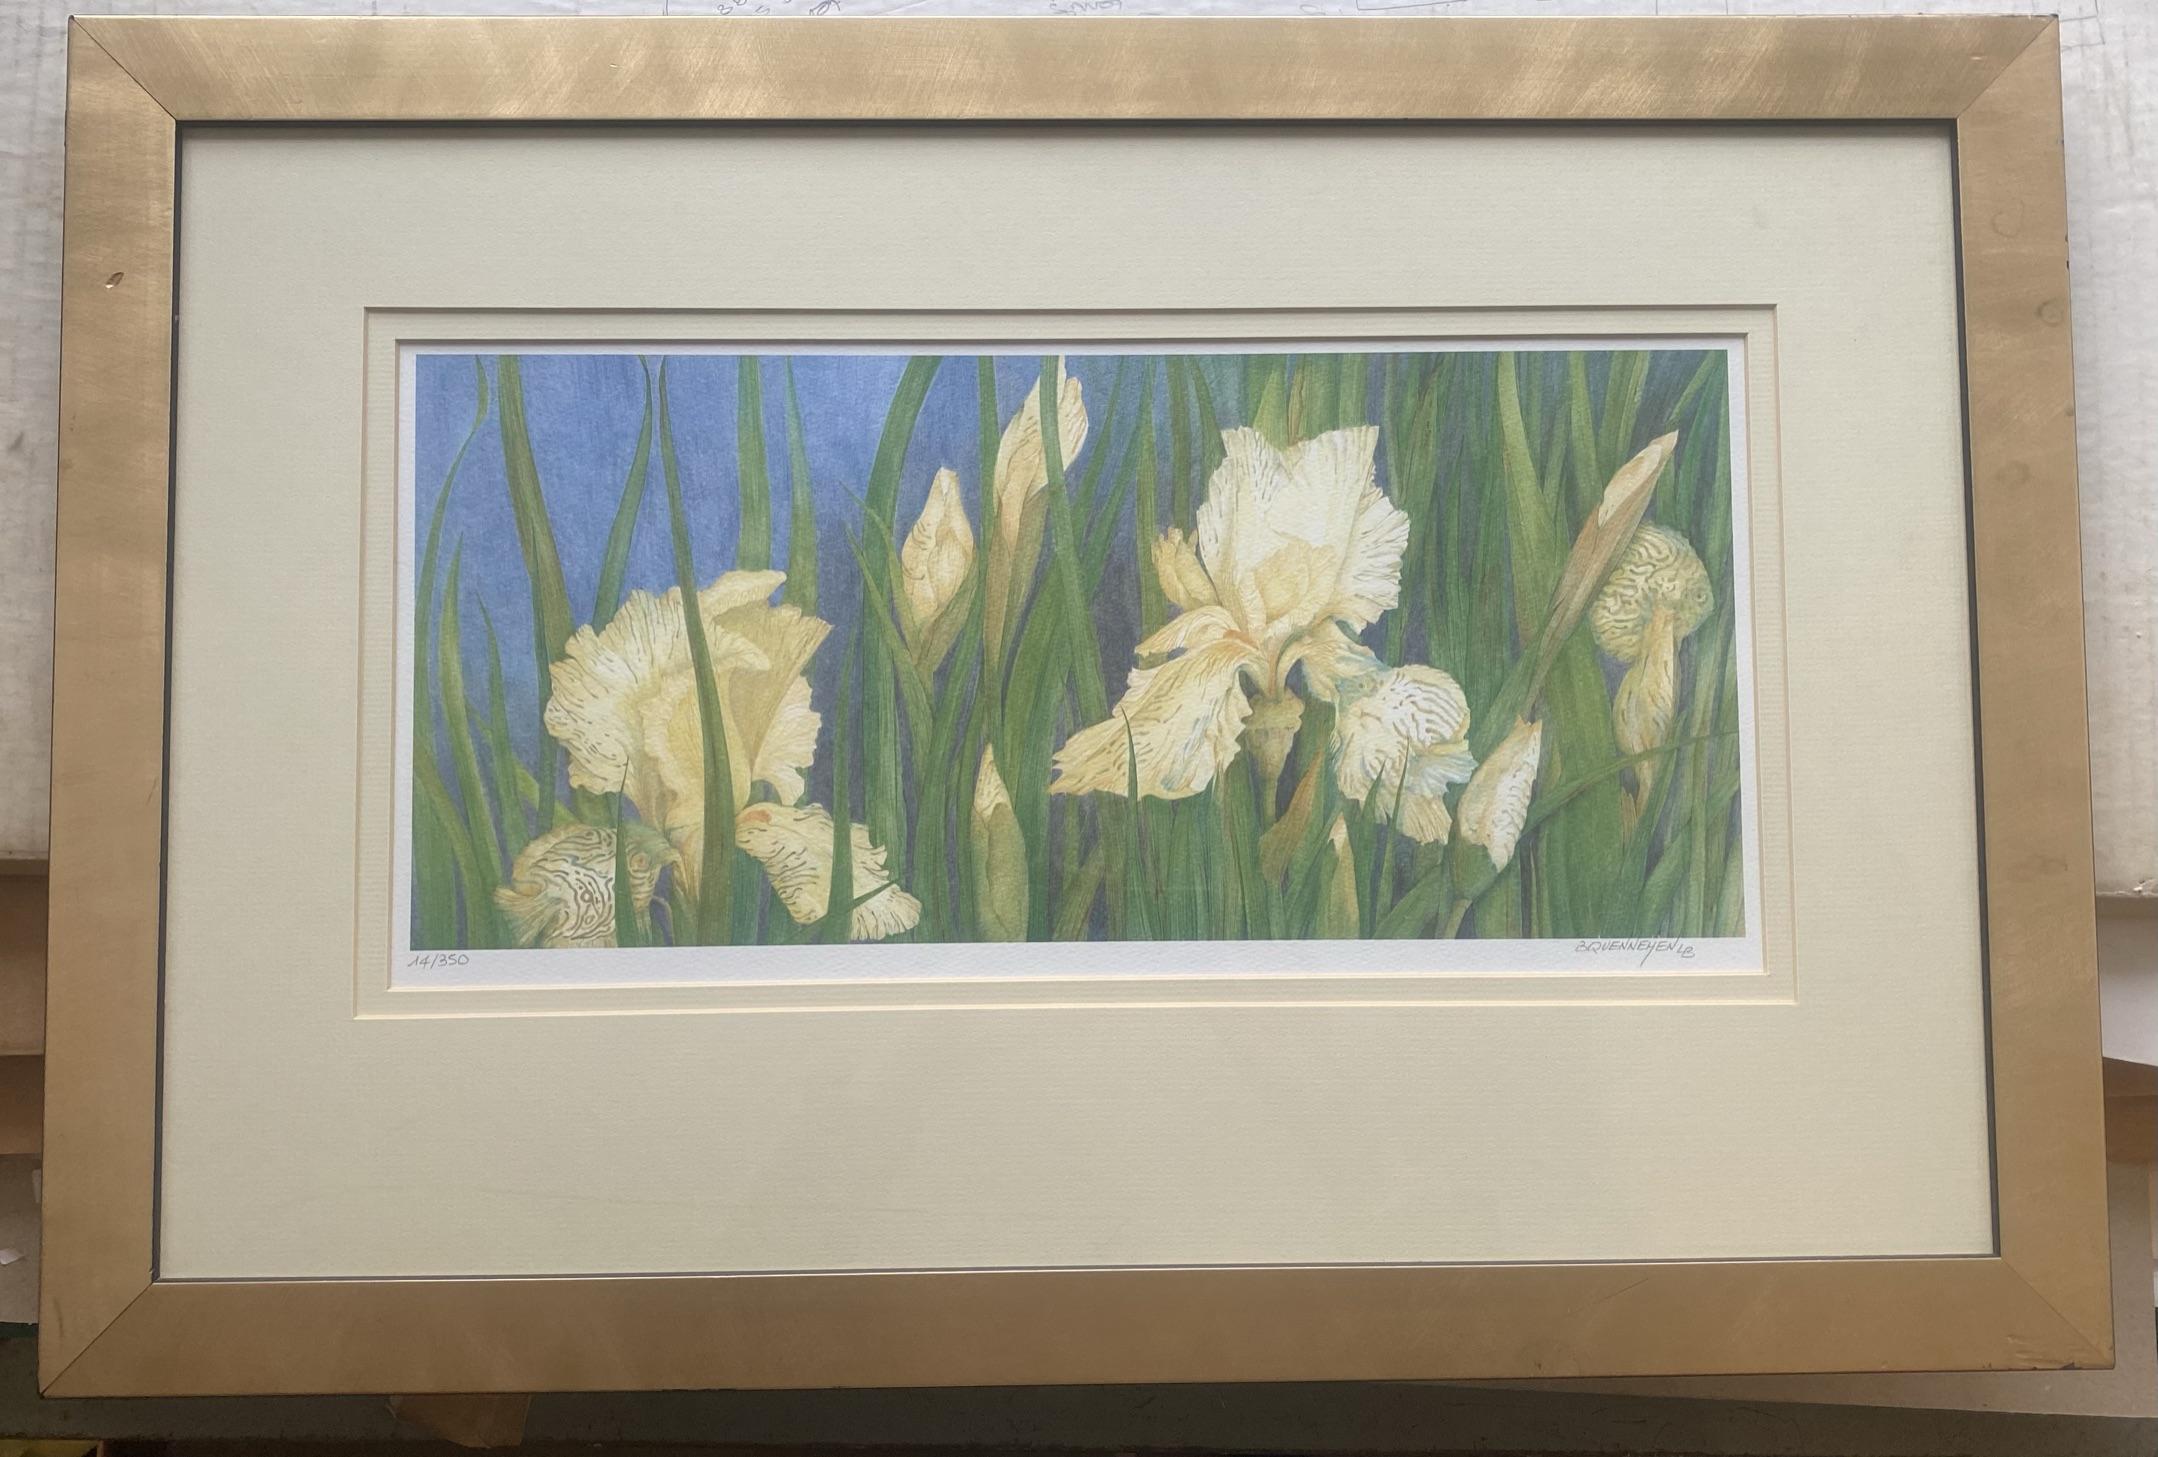 Brigitte Quennehen floral art print Discus - Image 2 of 4